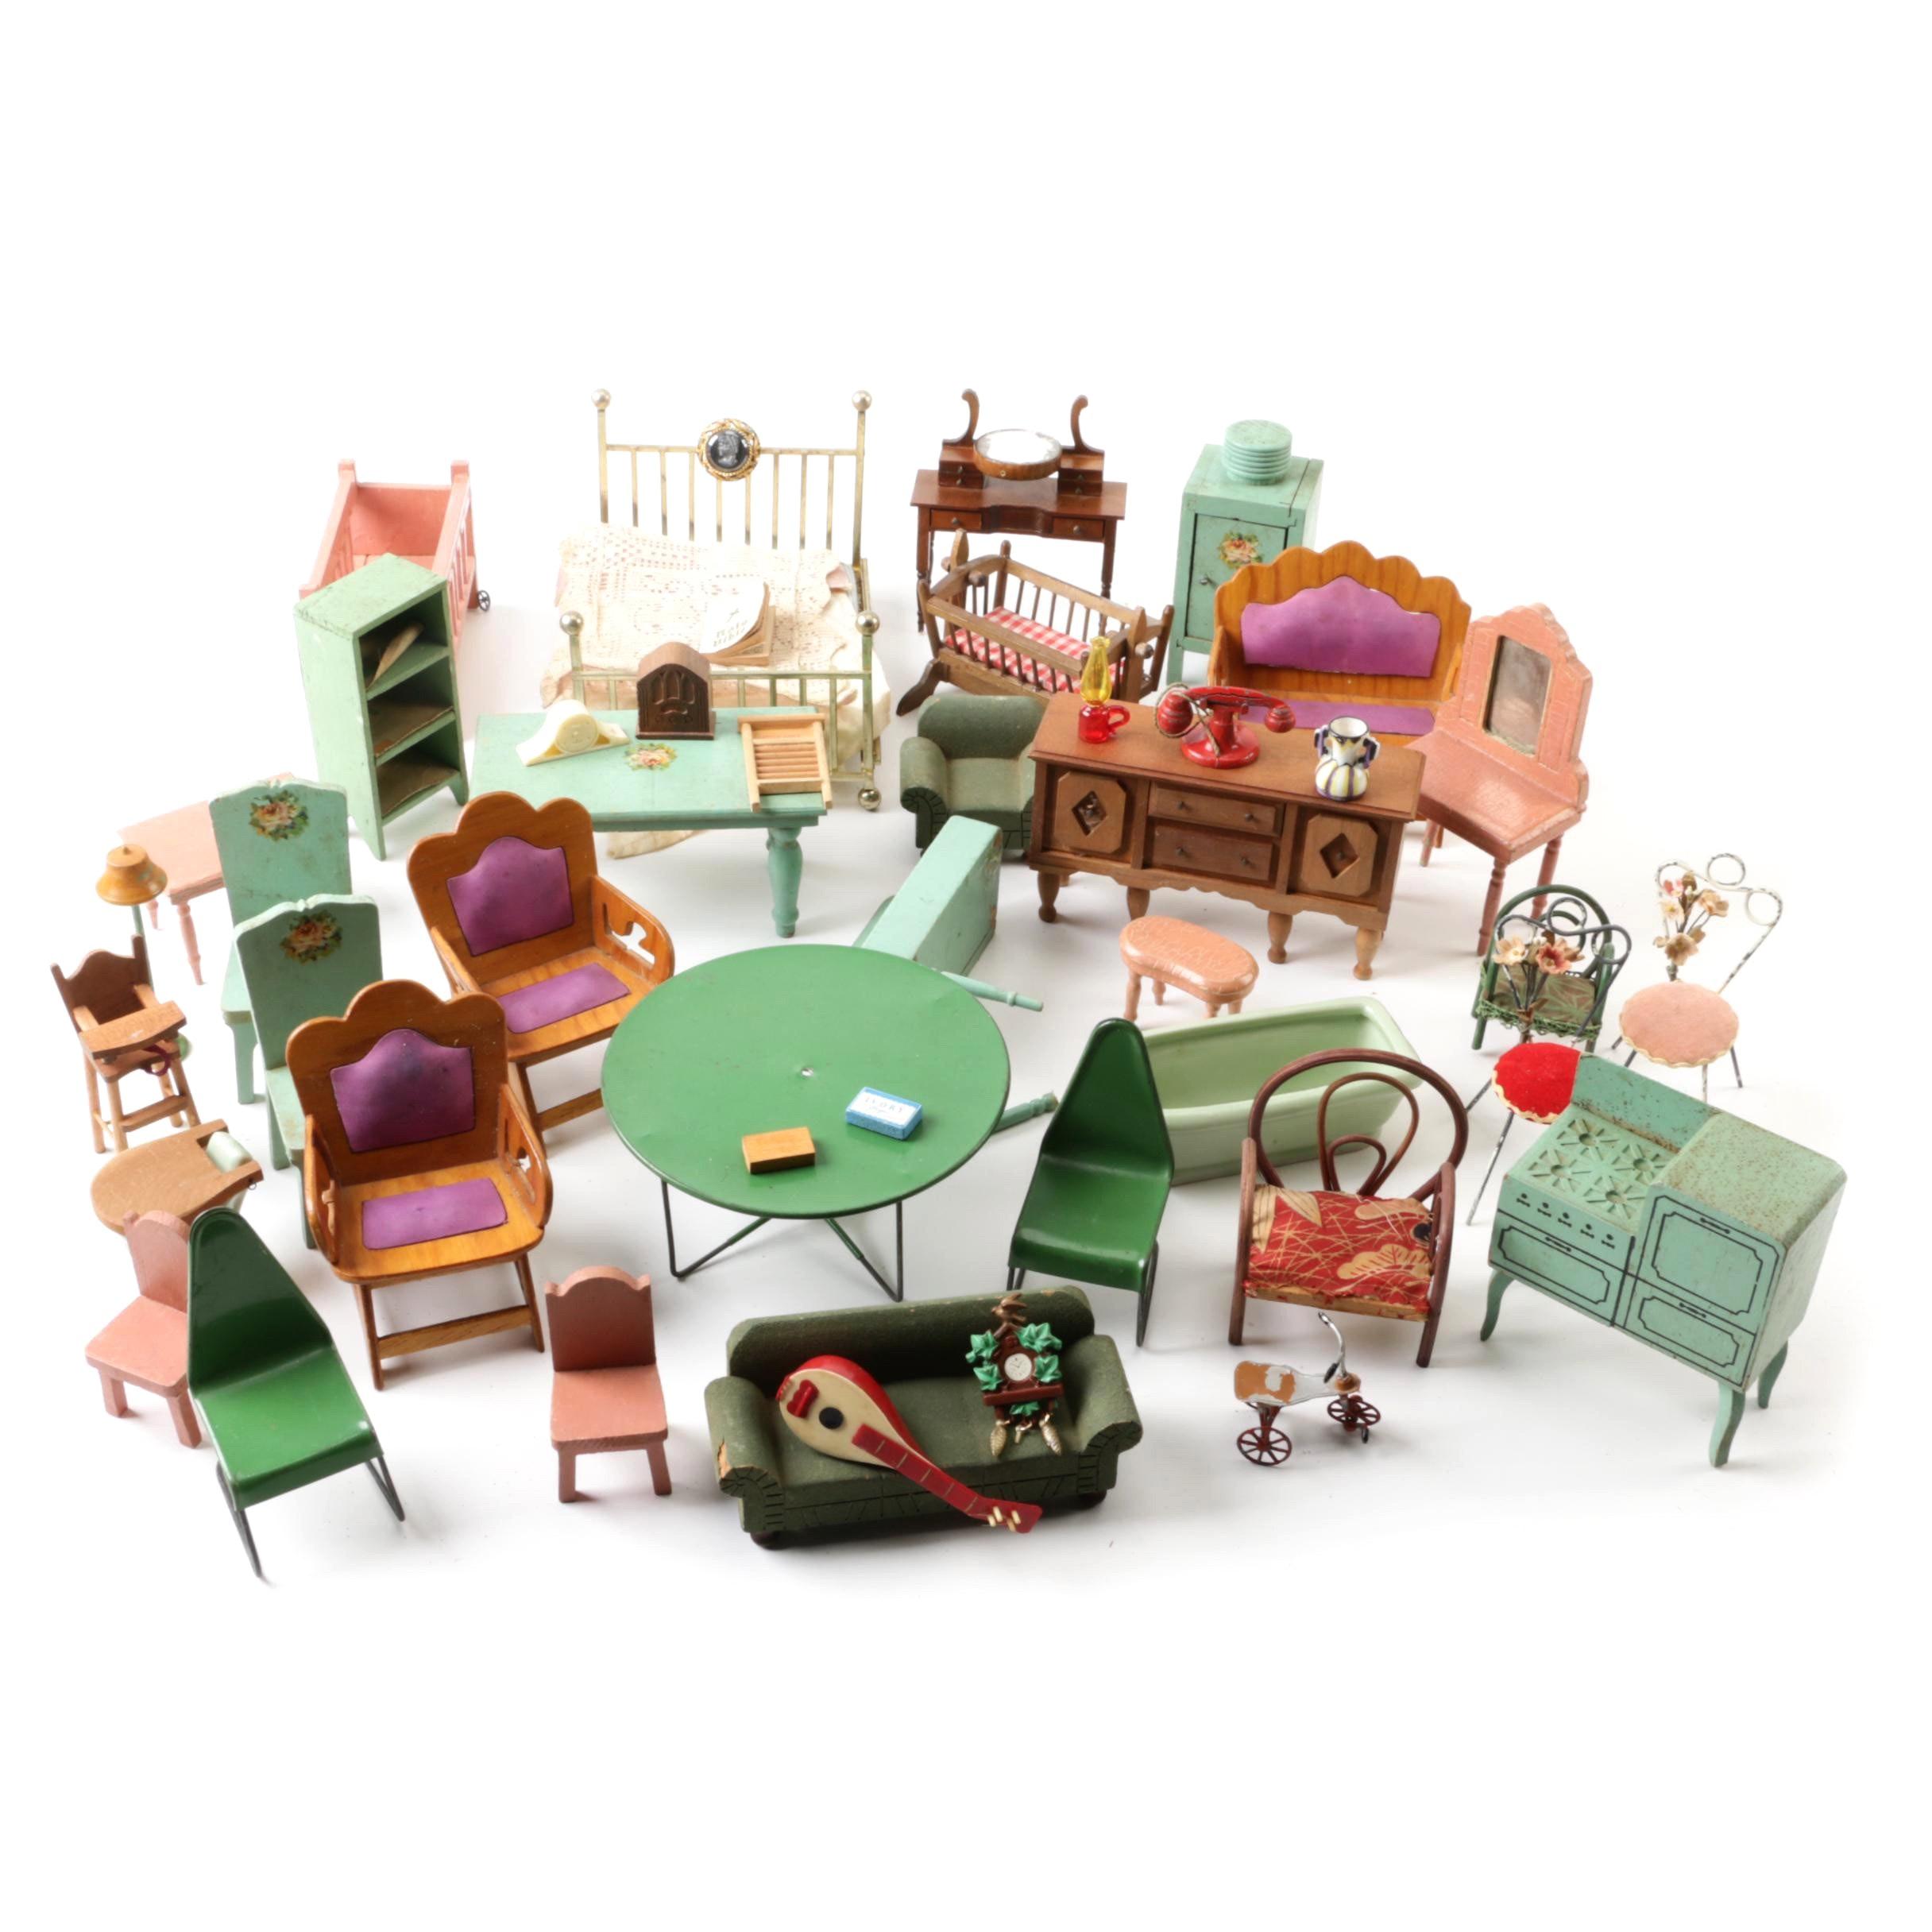 Vintage Dollhouse Furniture Featuring Shackman